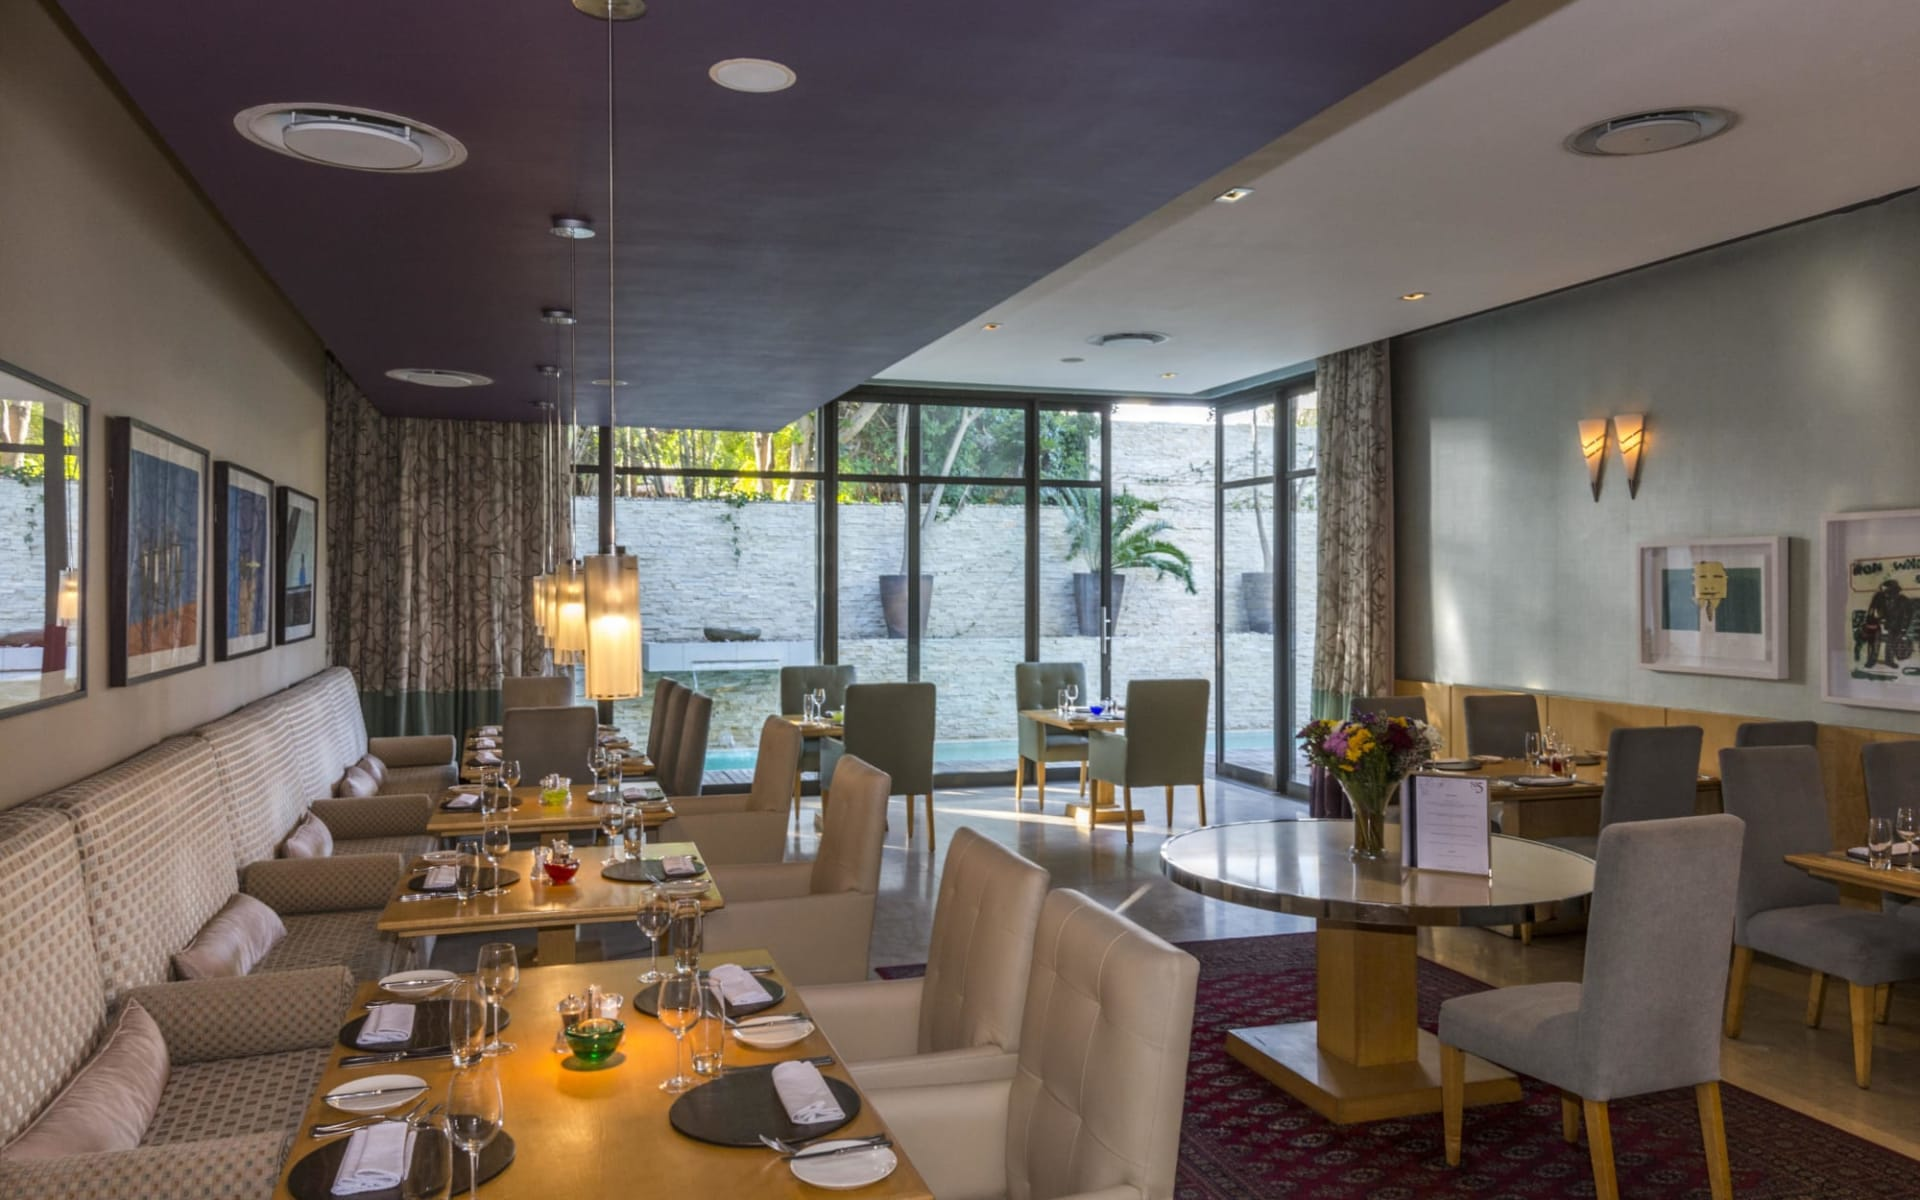 No 5 Boutique Hotel in Port Elizabeth:  No5 by Mantis-restaurant